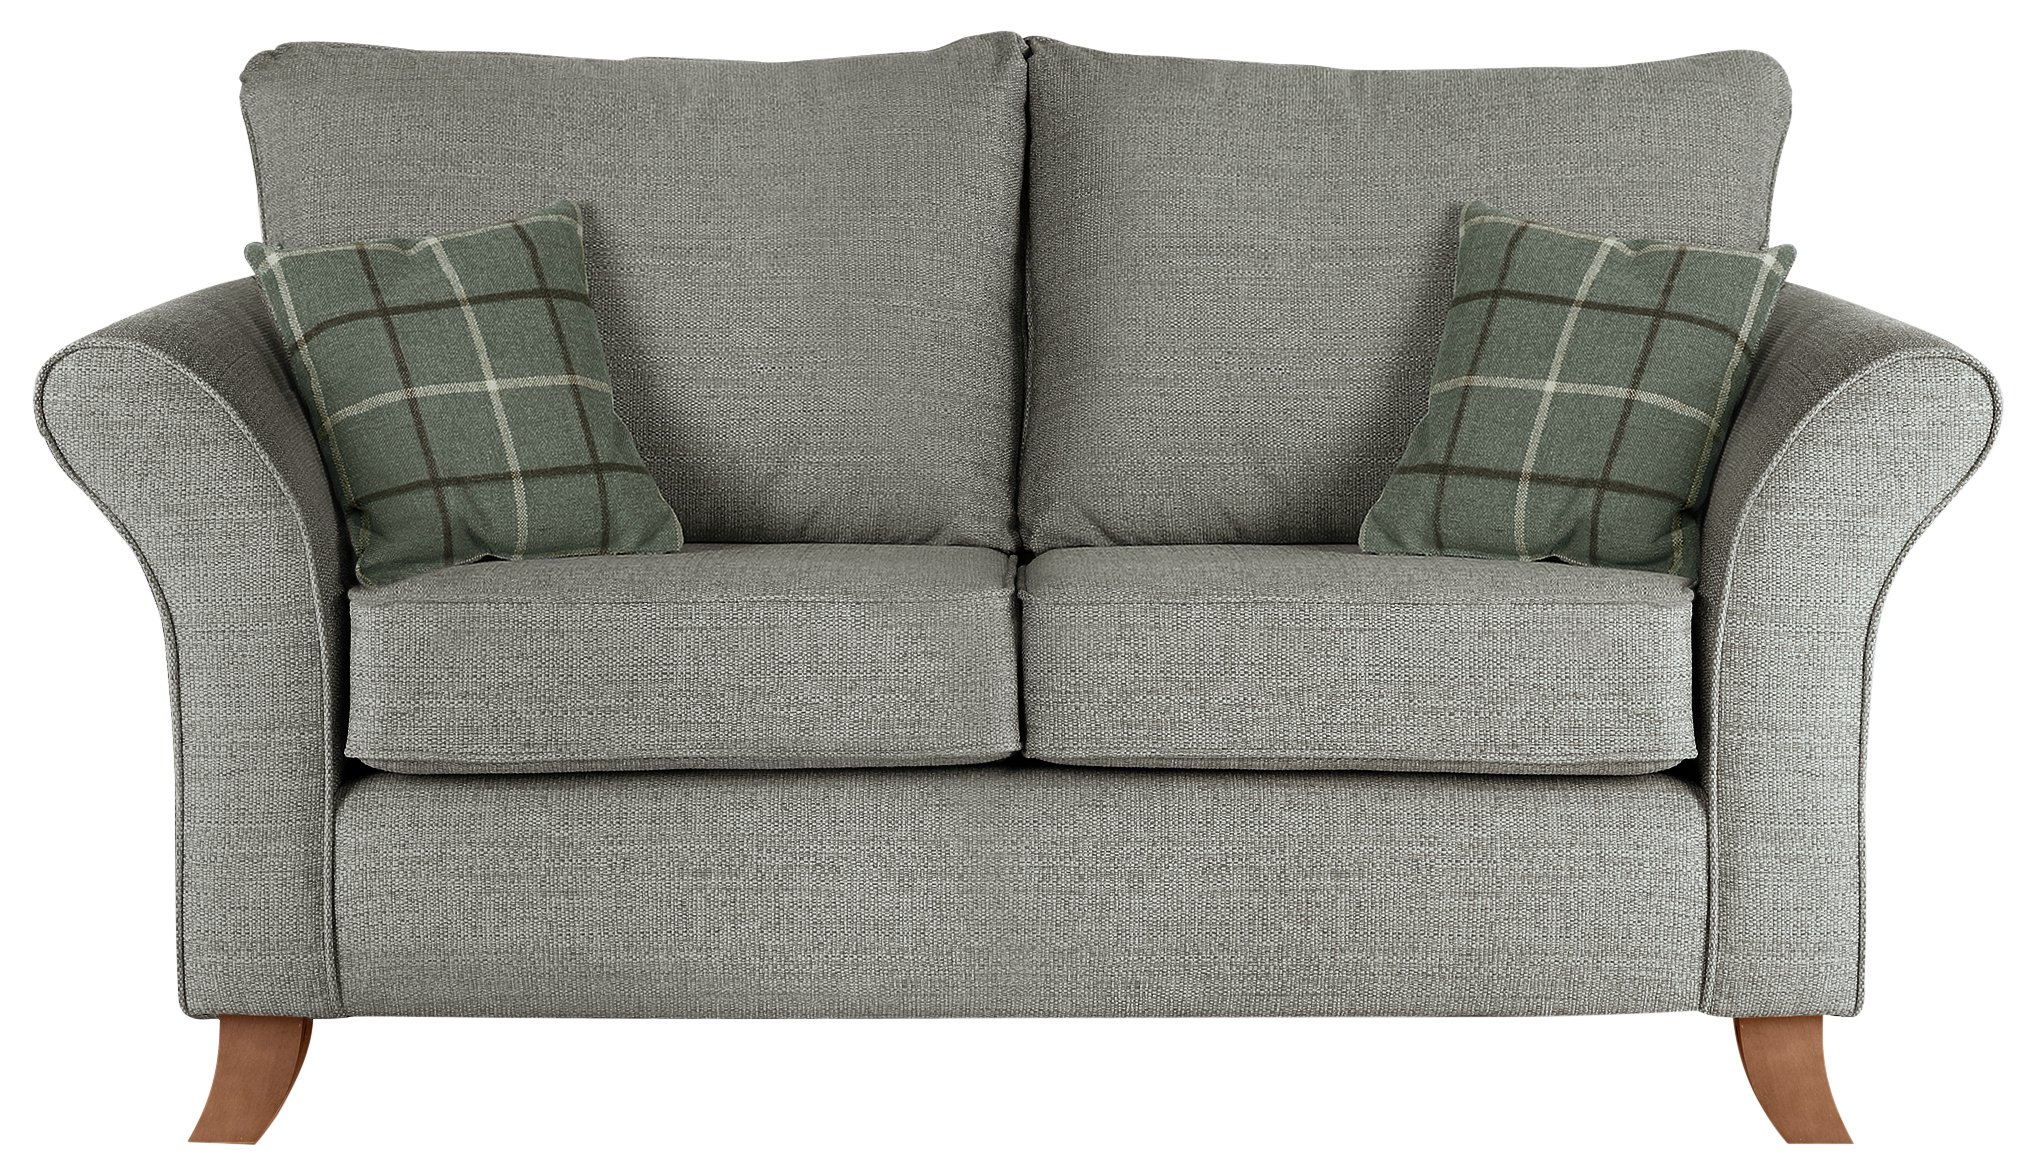 Argos Home Kayla 2 Seater Fabric Sofa - Light Grey